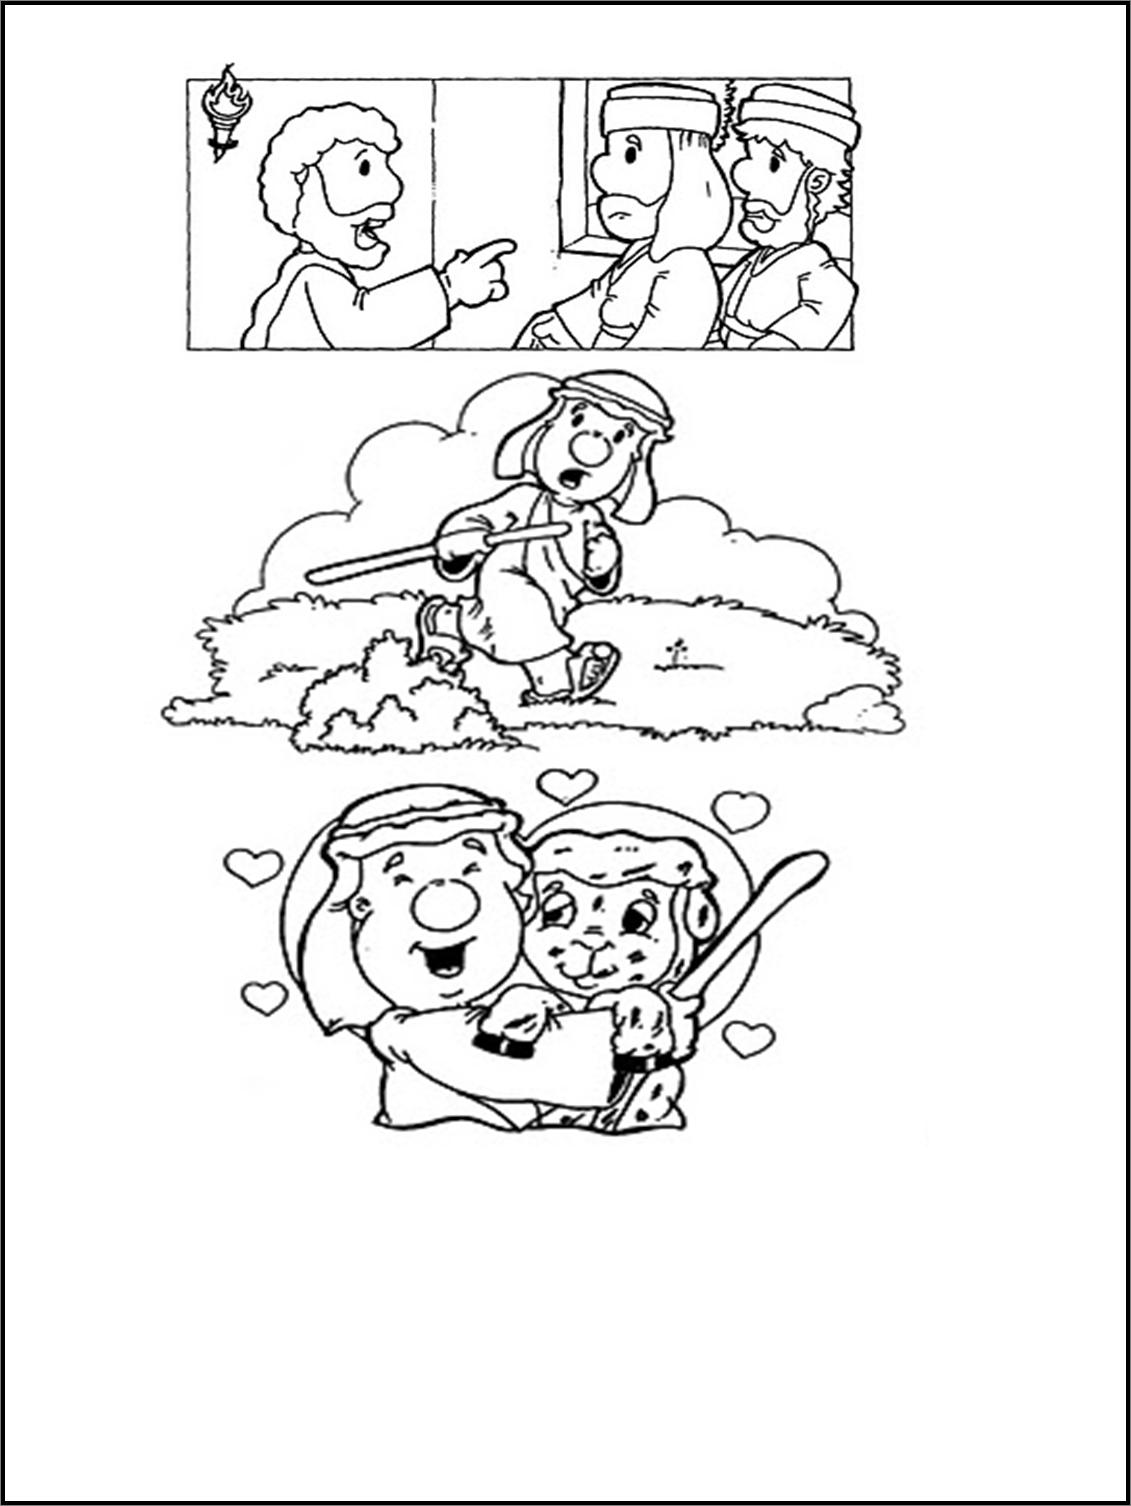 Oveja+perdida+2.png (1131×1506) | Páginas Para Colorear | Pinterest ...